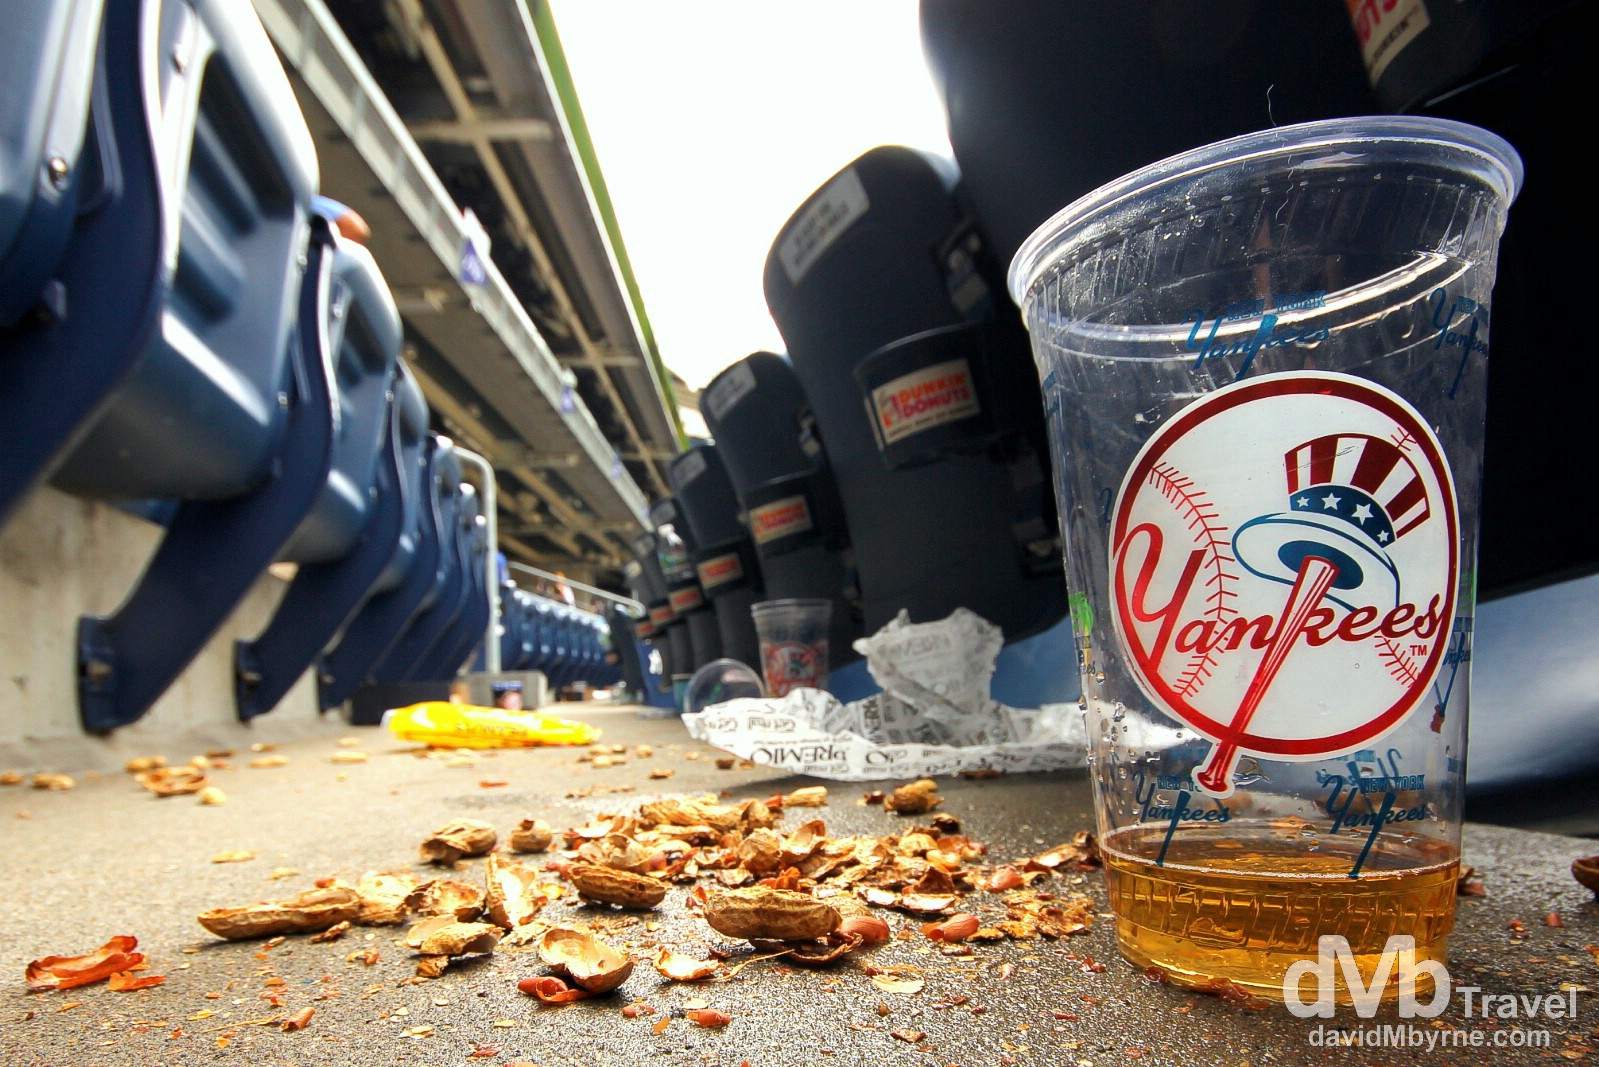 Peanuts & beer. Yankee Stadium, The Bronx, New York. July 13th 2013.